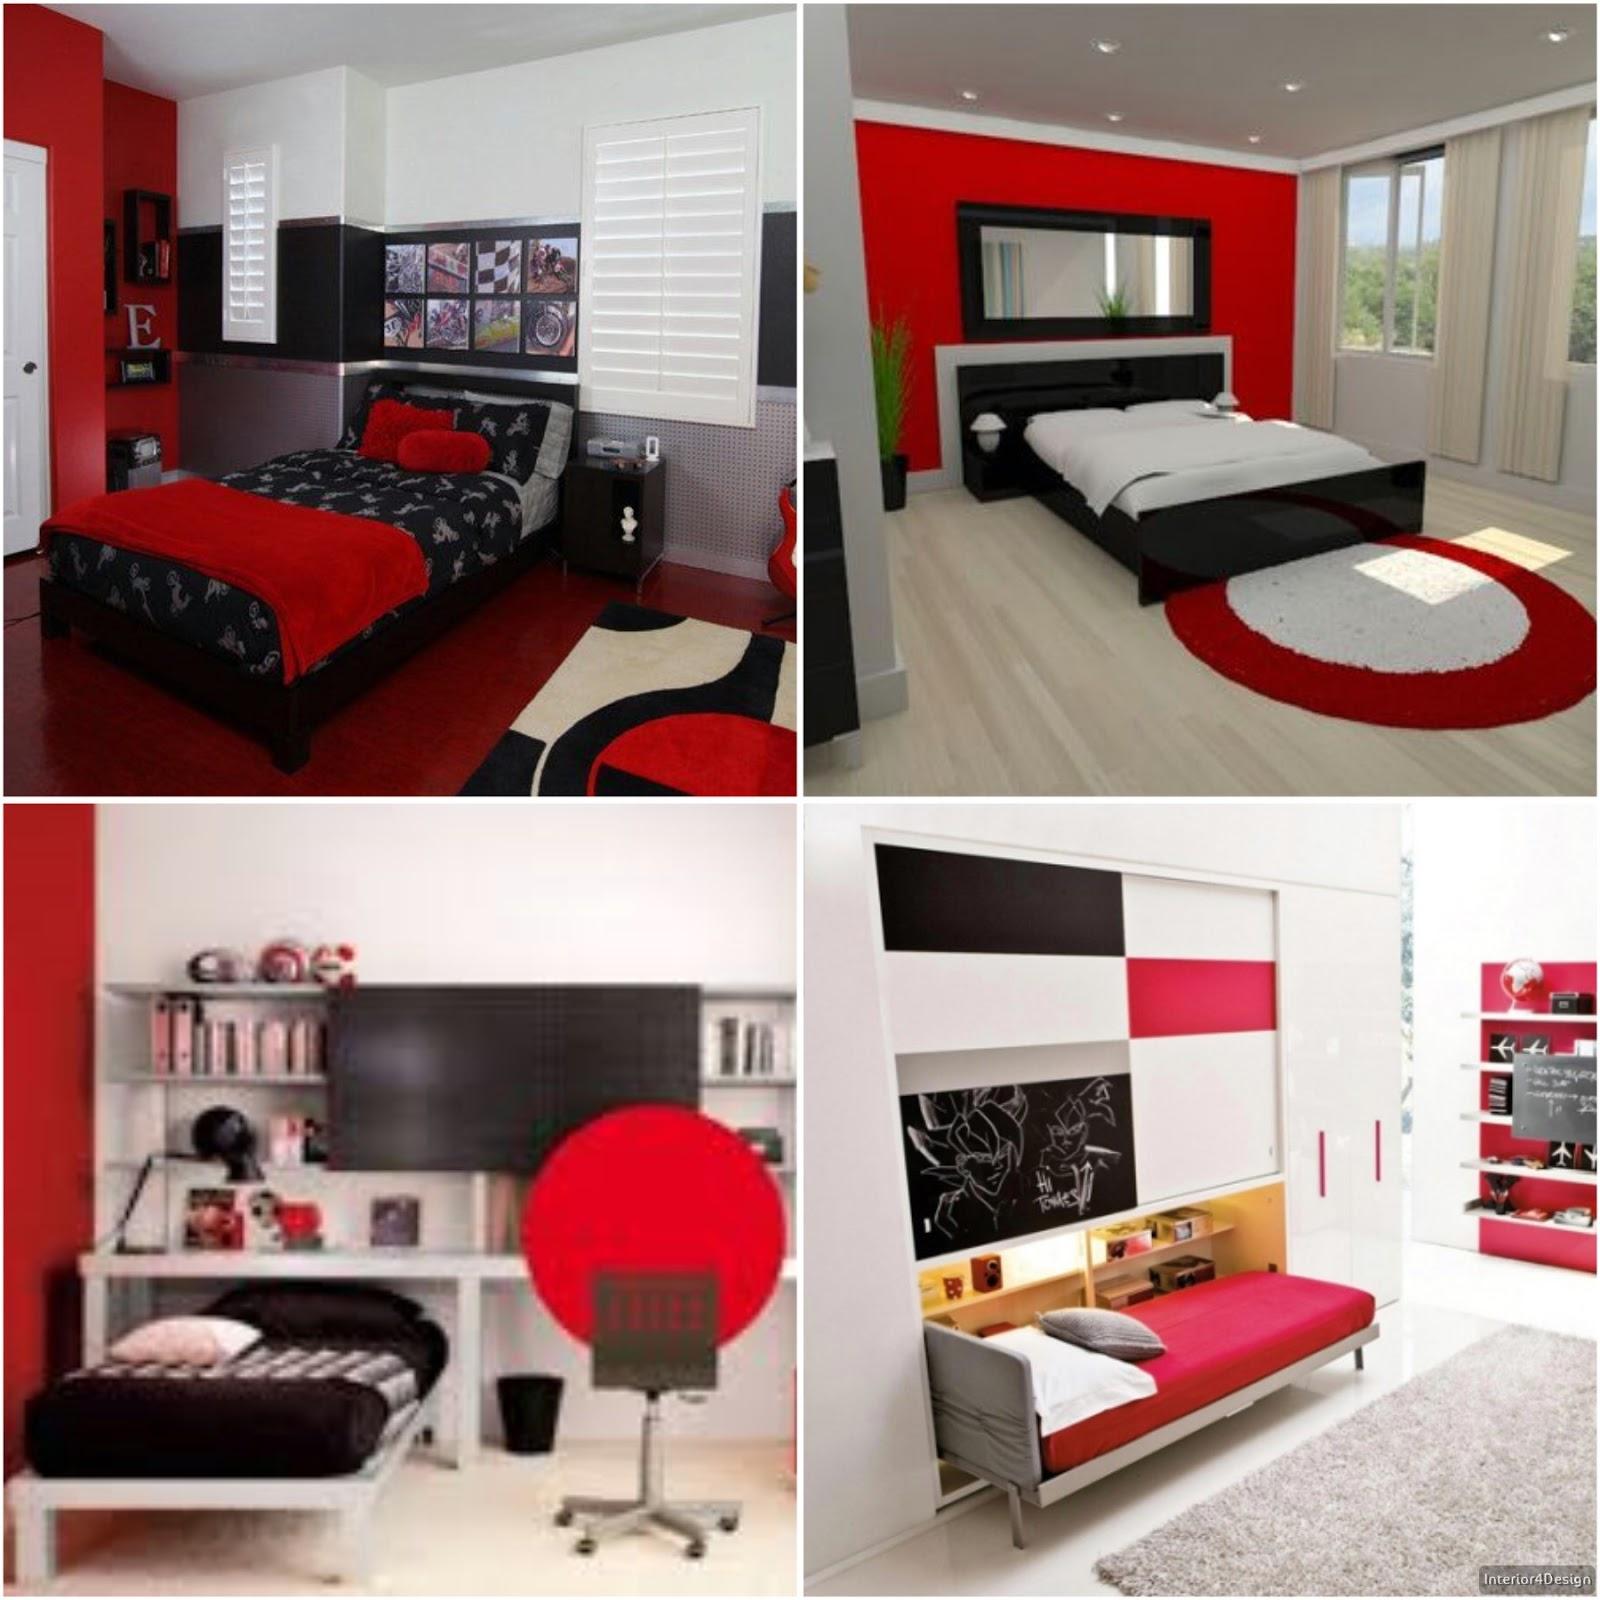 Elegant Kids Bedrooms - Design In Red And Black | Best ...